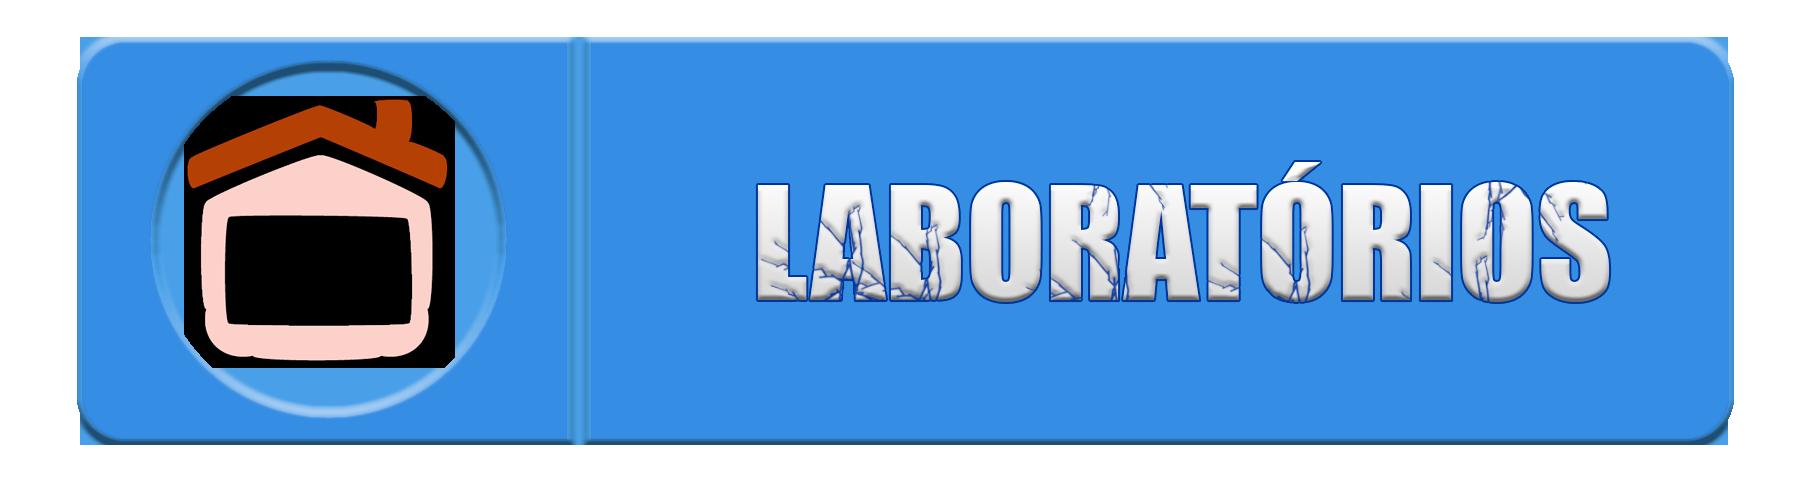 laboratorios.png